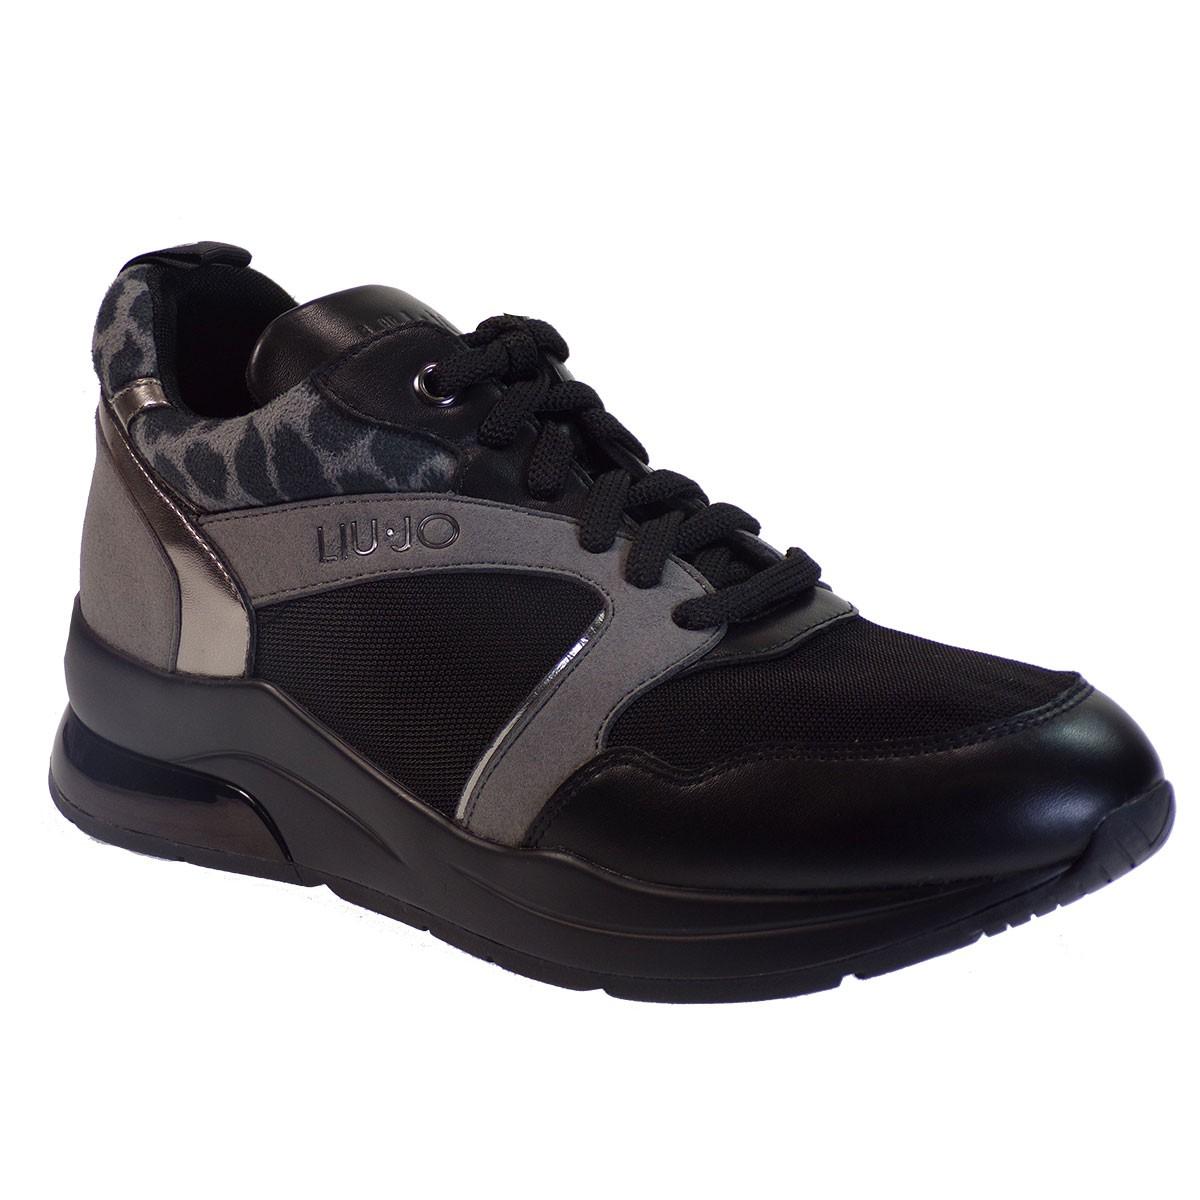 Liu-Jo Sneakers KARLIE 23 Παπούτσια Γυναικεία B69031 Μαύρο